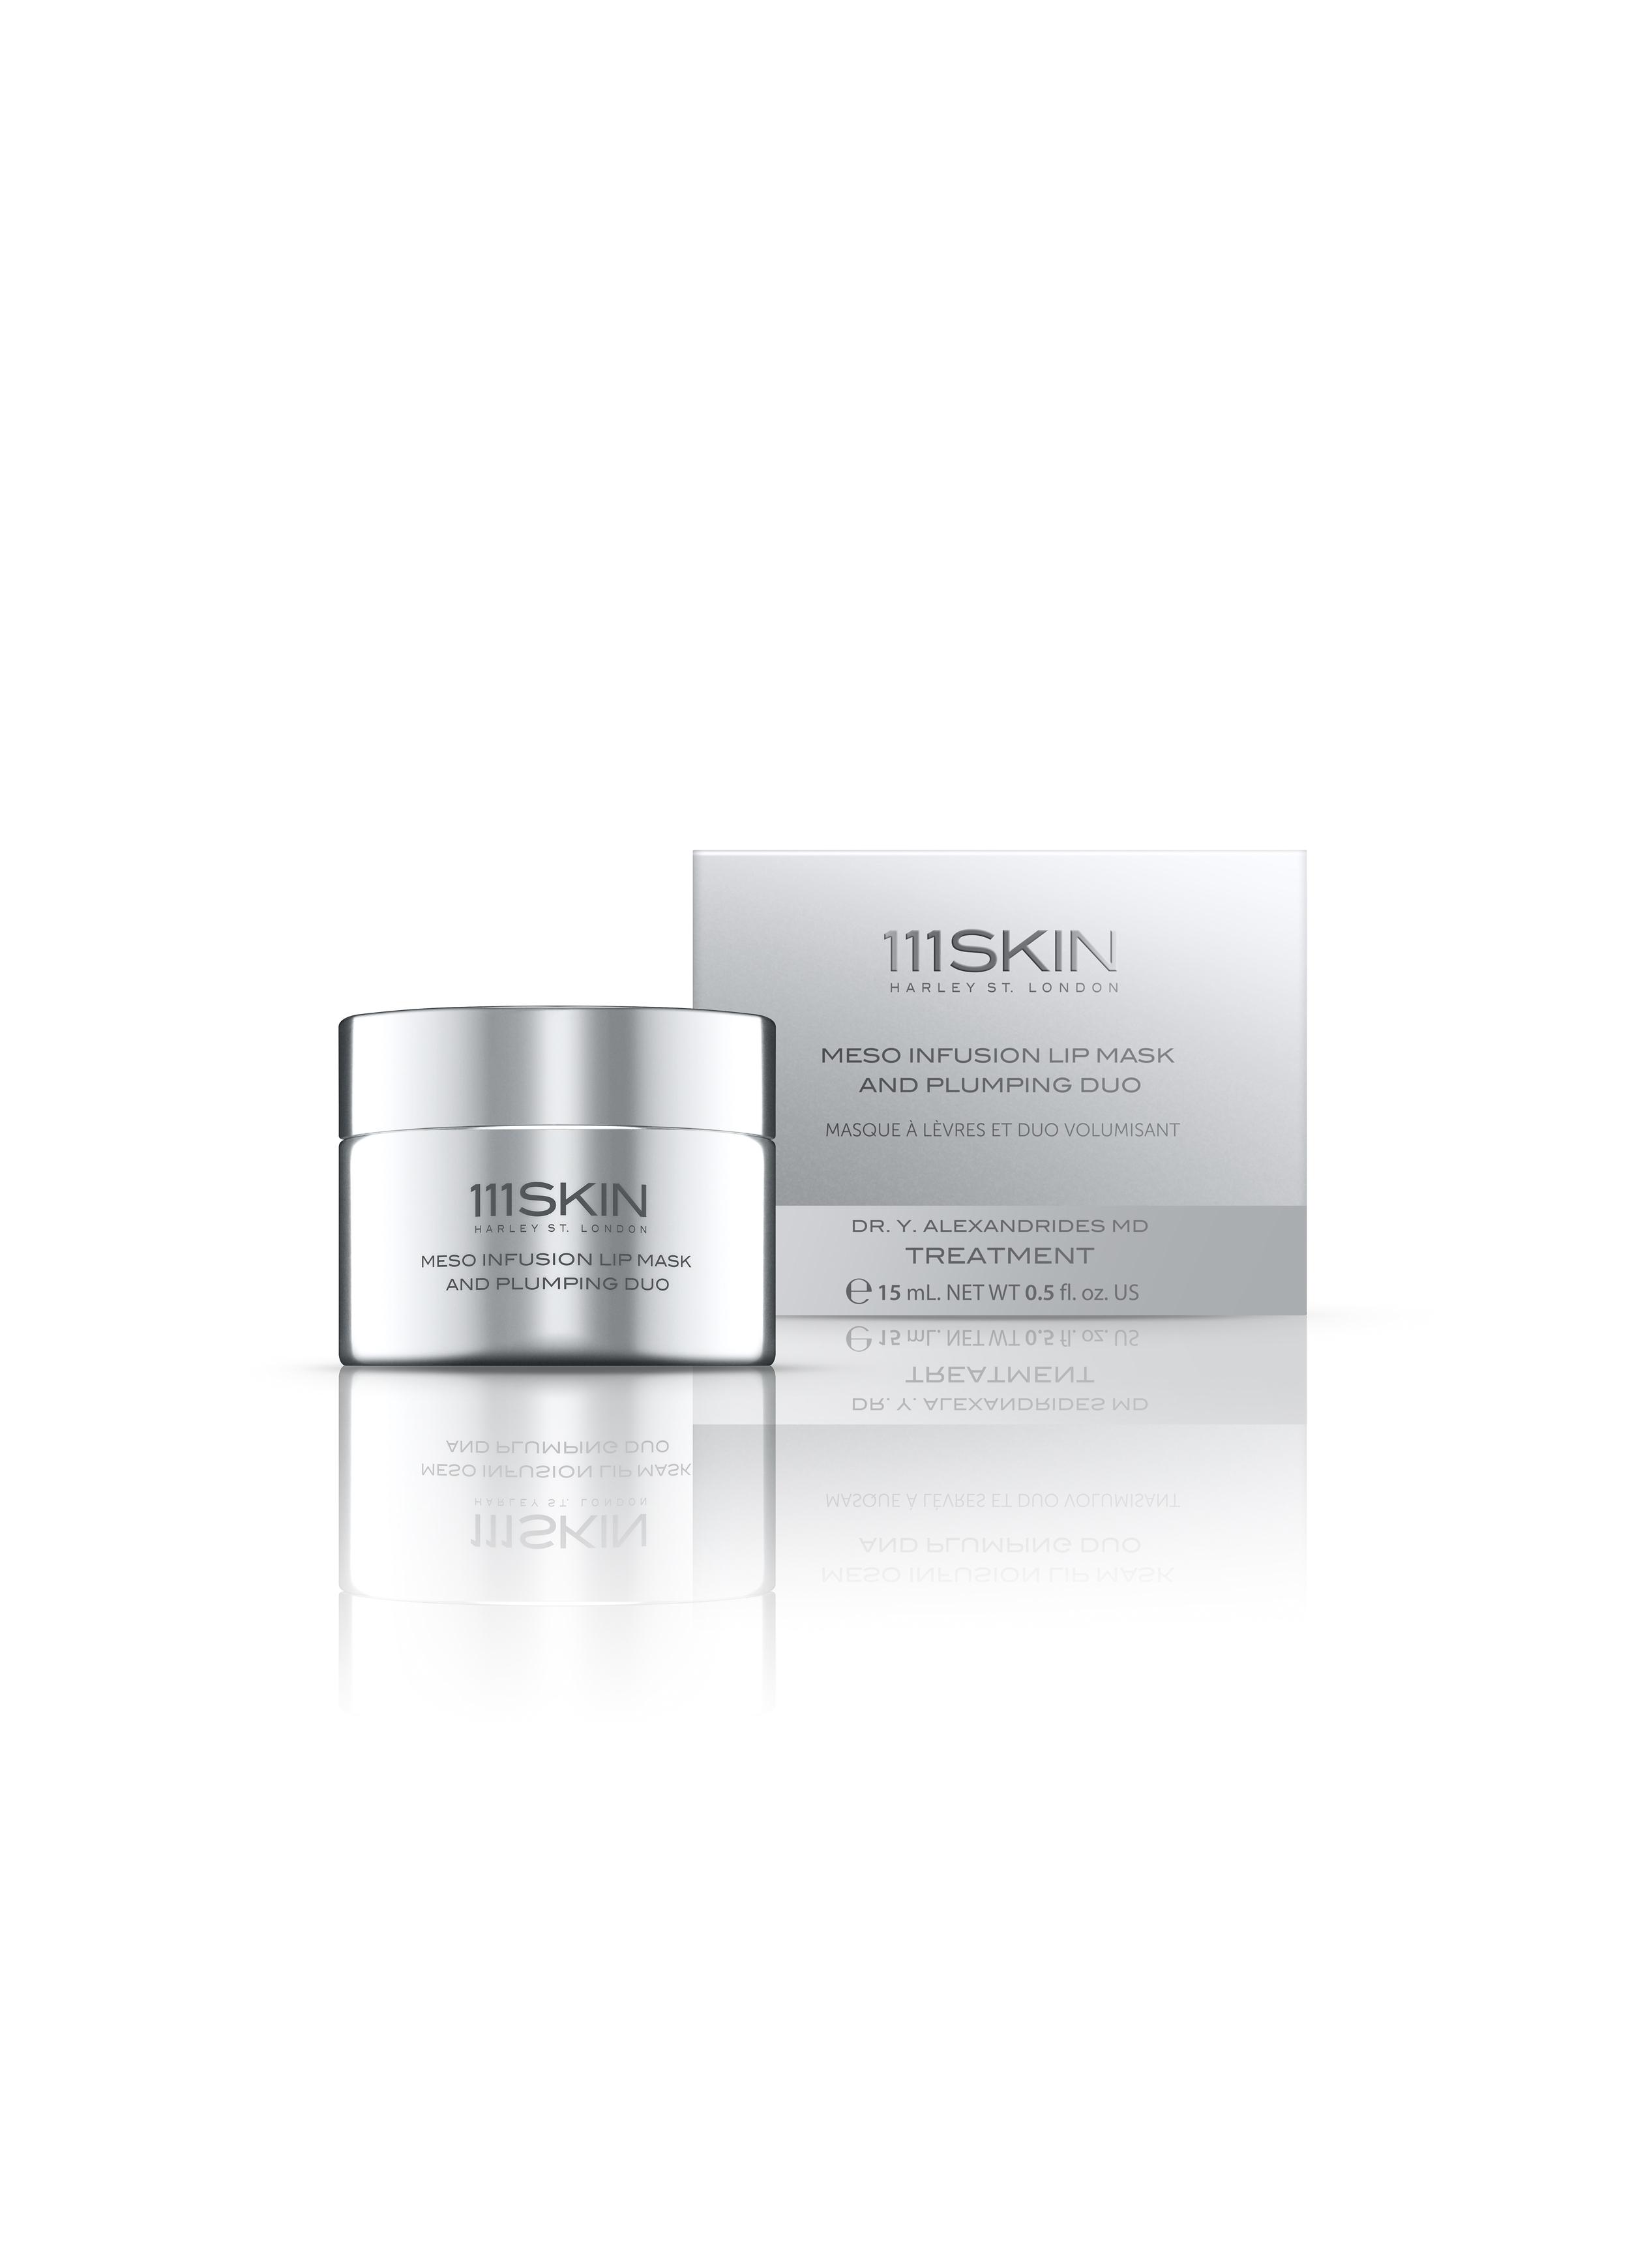 111-skin-meso-infusion-lip-duo